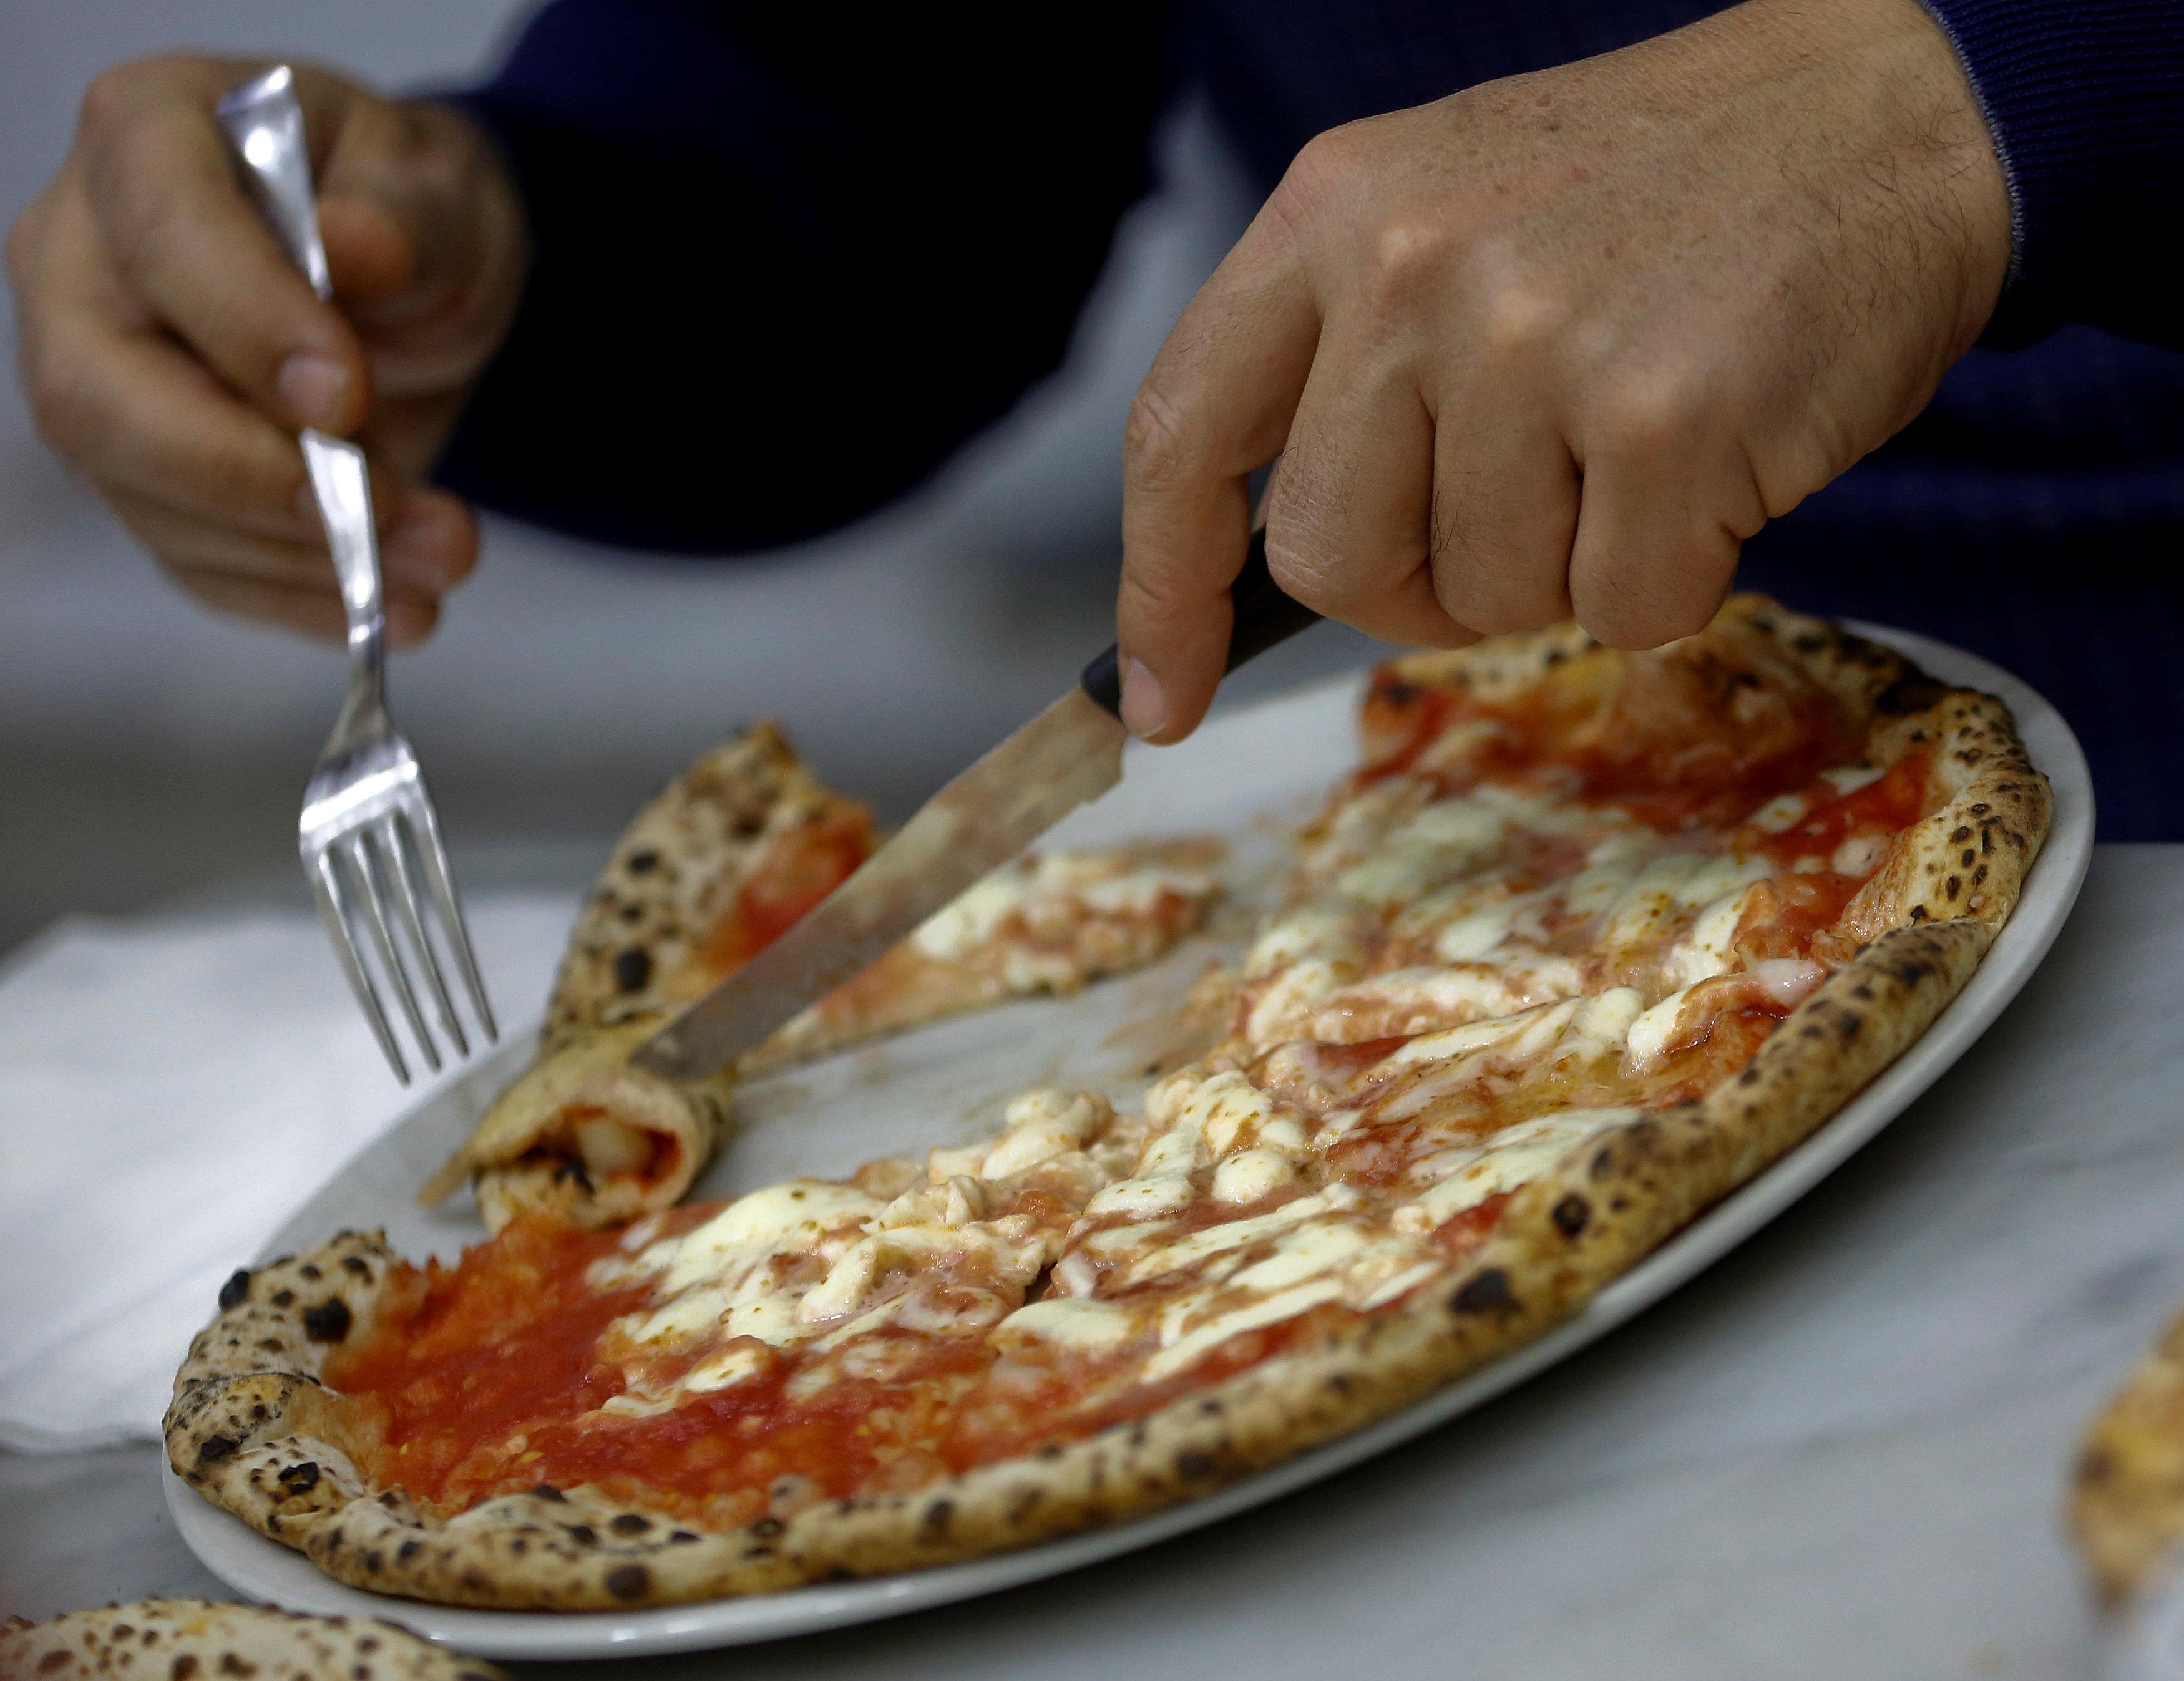 Koch verprügelt Gast nach Pizza-Beschwerde